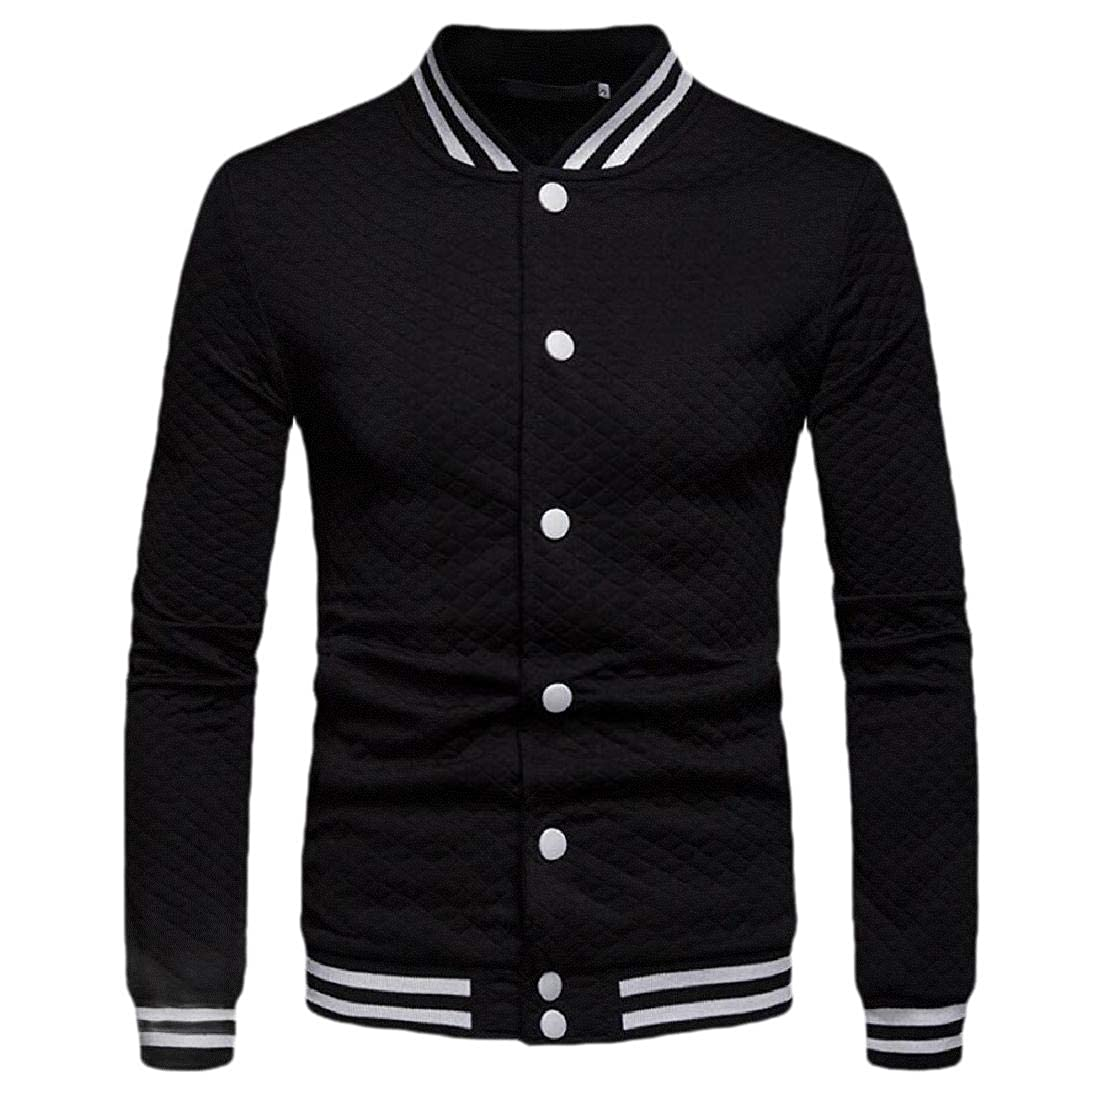 heymoney Mens Dress Shirts Long Sleeve Shirt Button Down Casual Tees